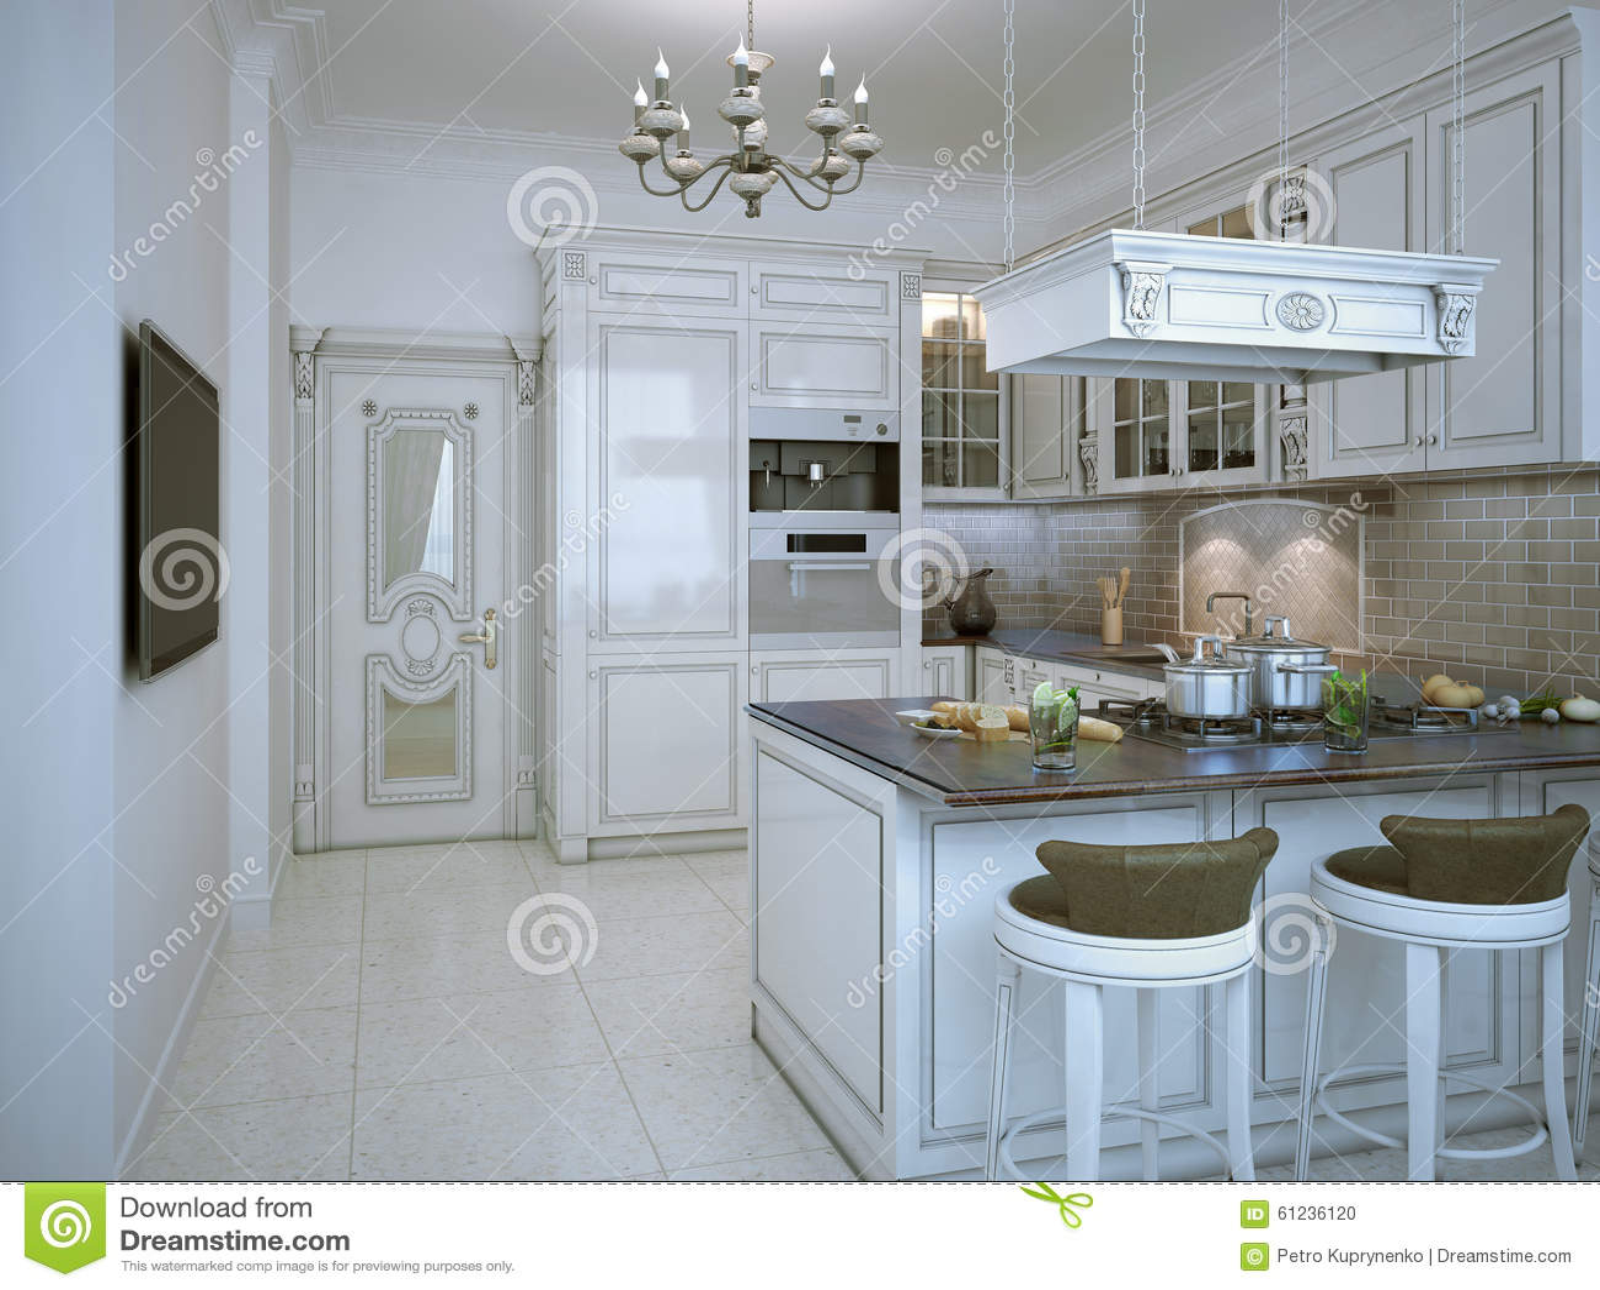 kitchen art cabinets online design 光滑的厨房艺术装饰样式库存例证 插画包括有豪华 机柜 艺术 经典 与酒吧和电视的光滑的厨房艺术装饰样式白色内部 优美的瓦片地板3d回报